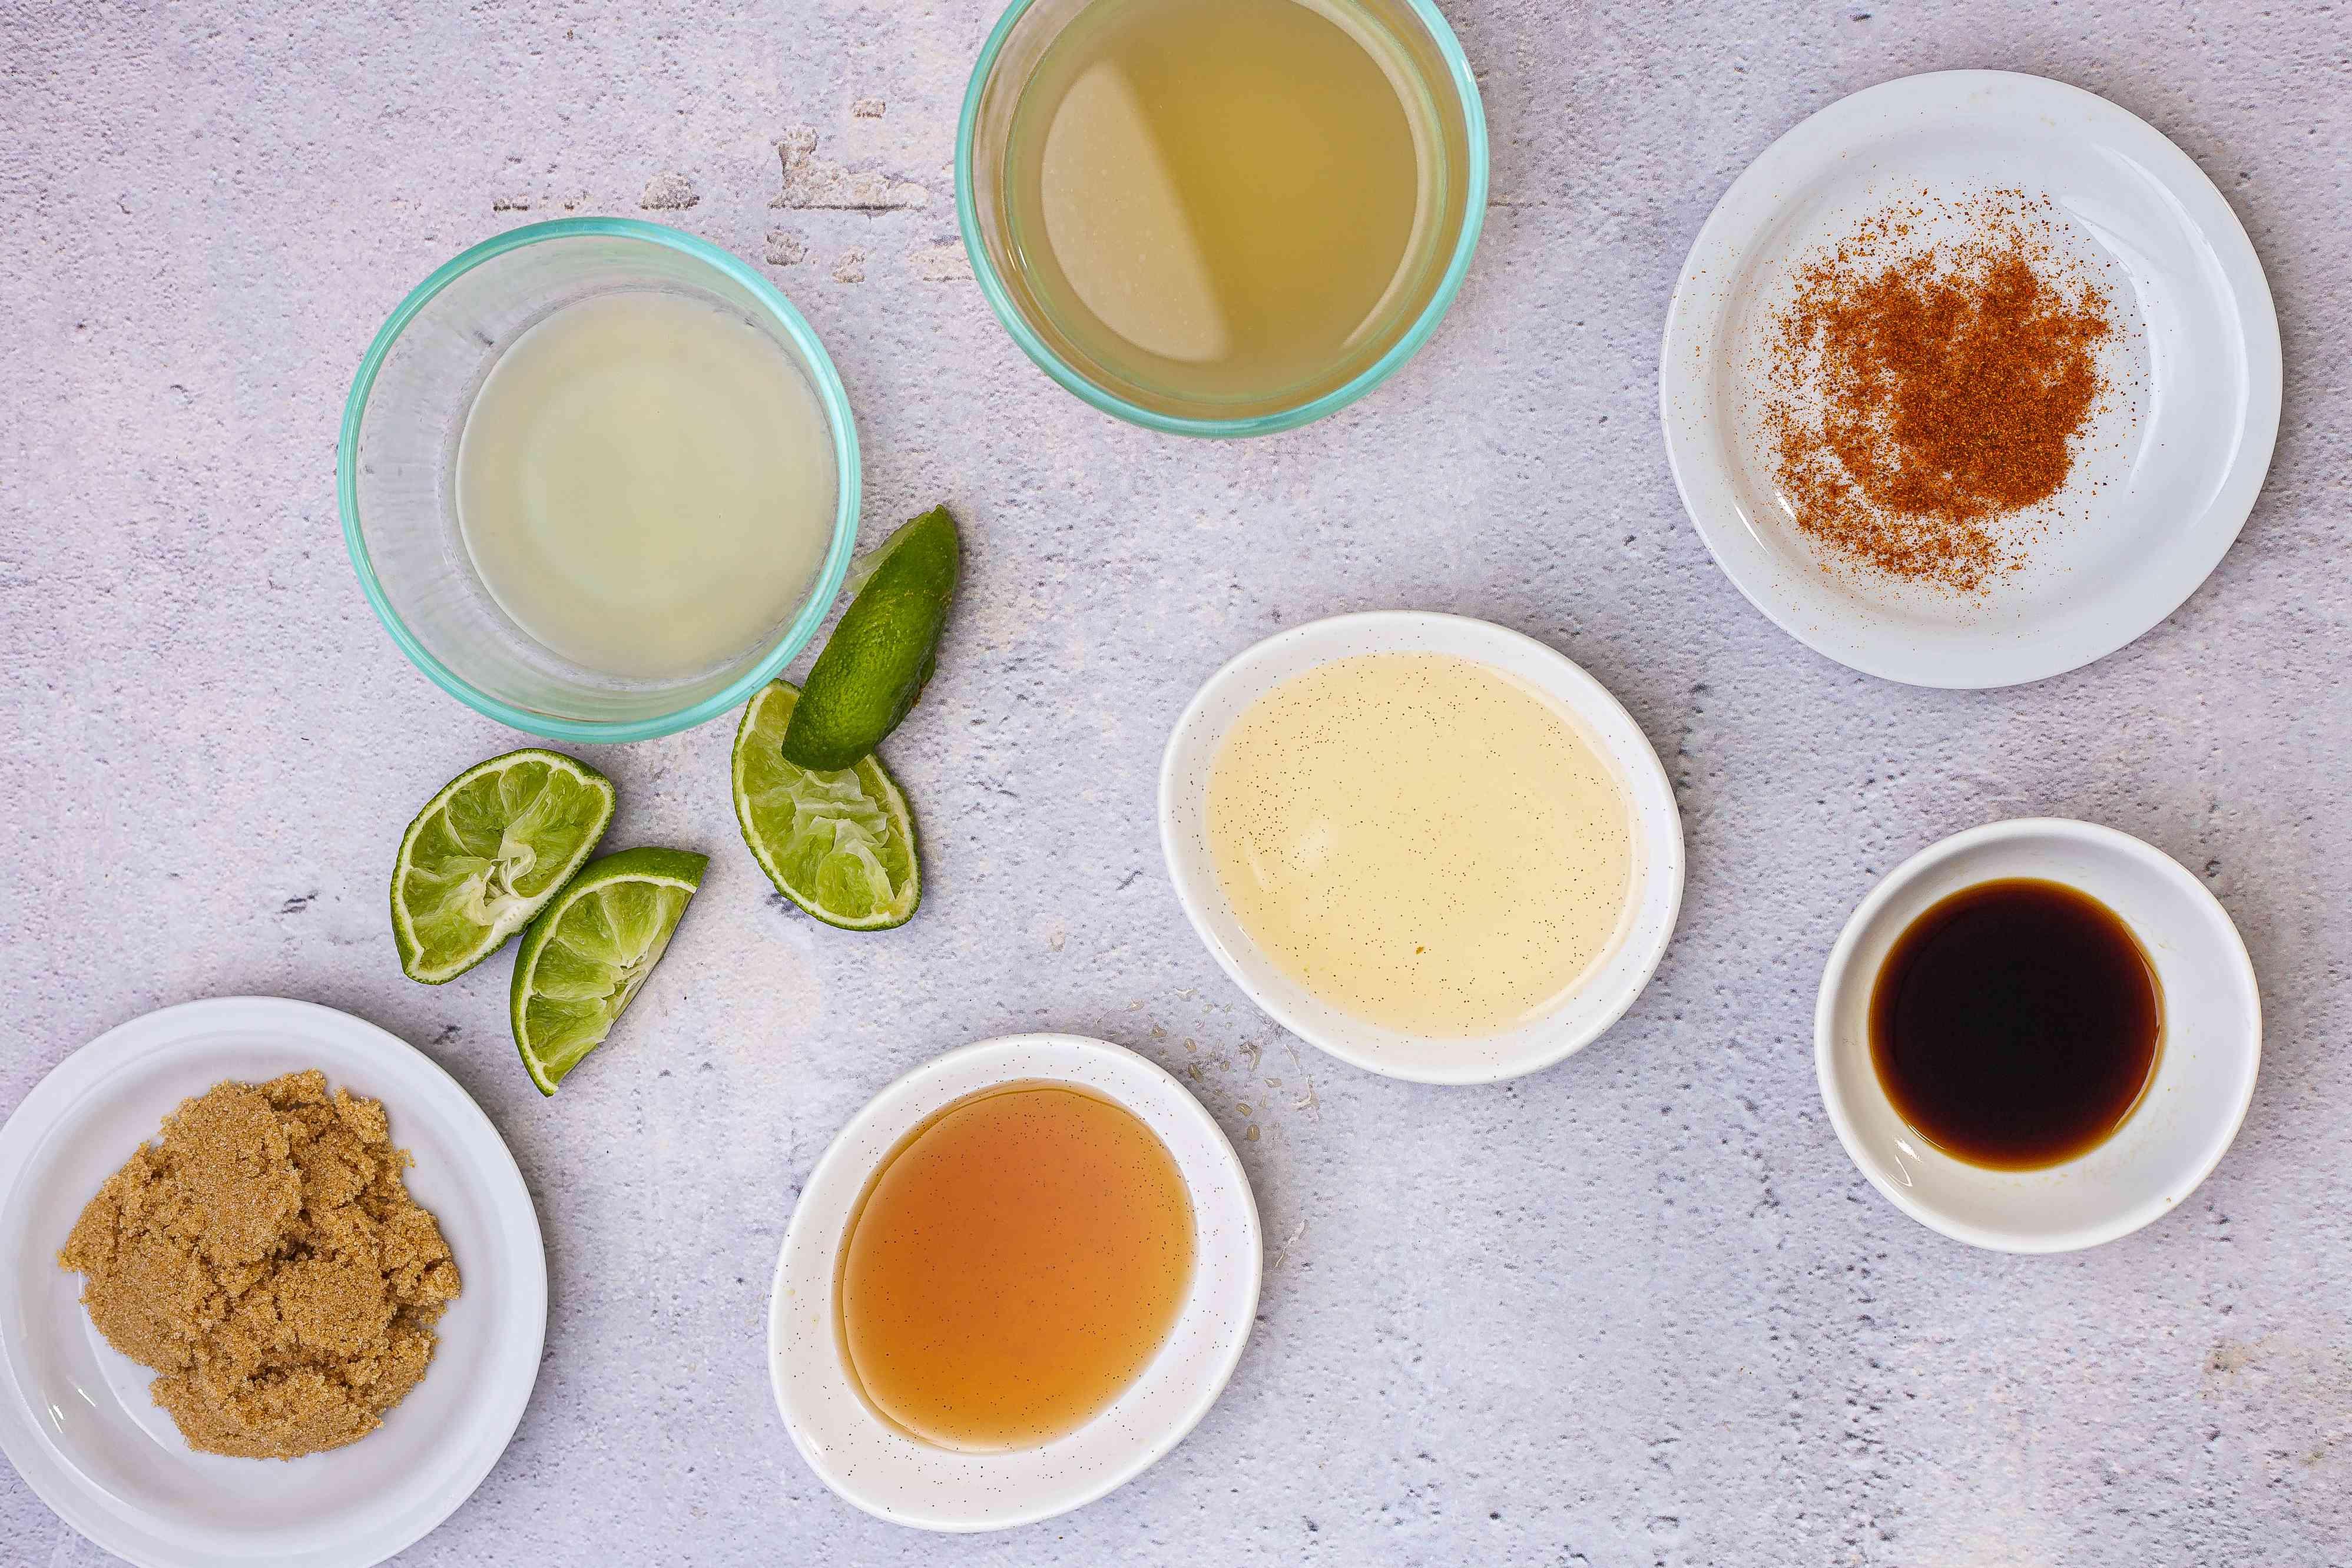 Ingredients for easy pad thai